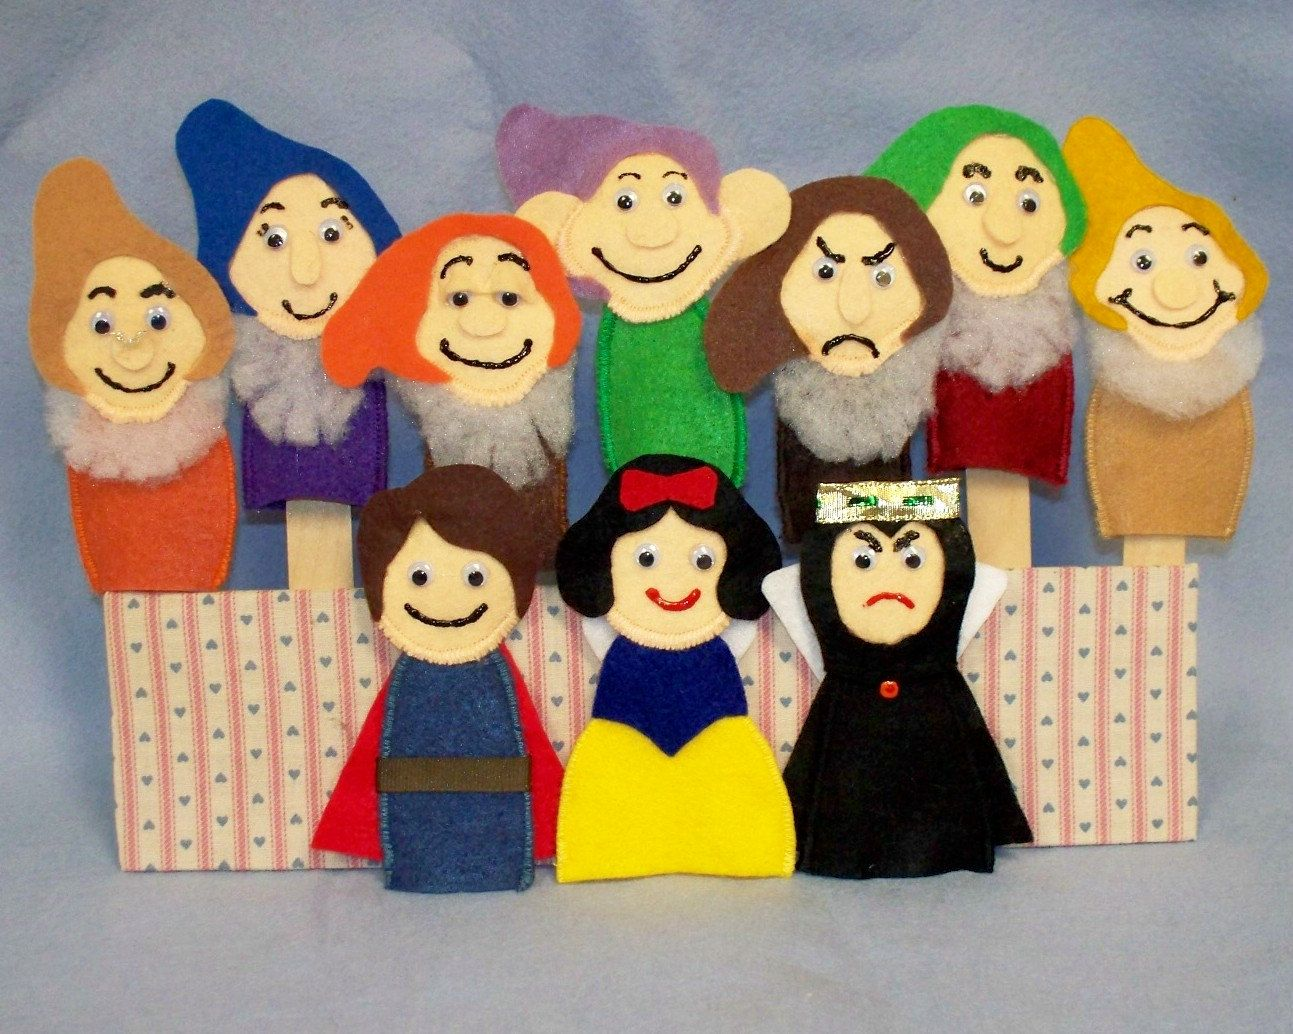 Snow white apron etsy - Snow White And The Seven Dwarfs Felt Finger Puppets